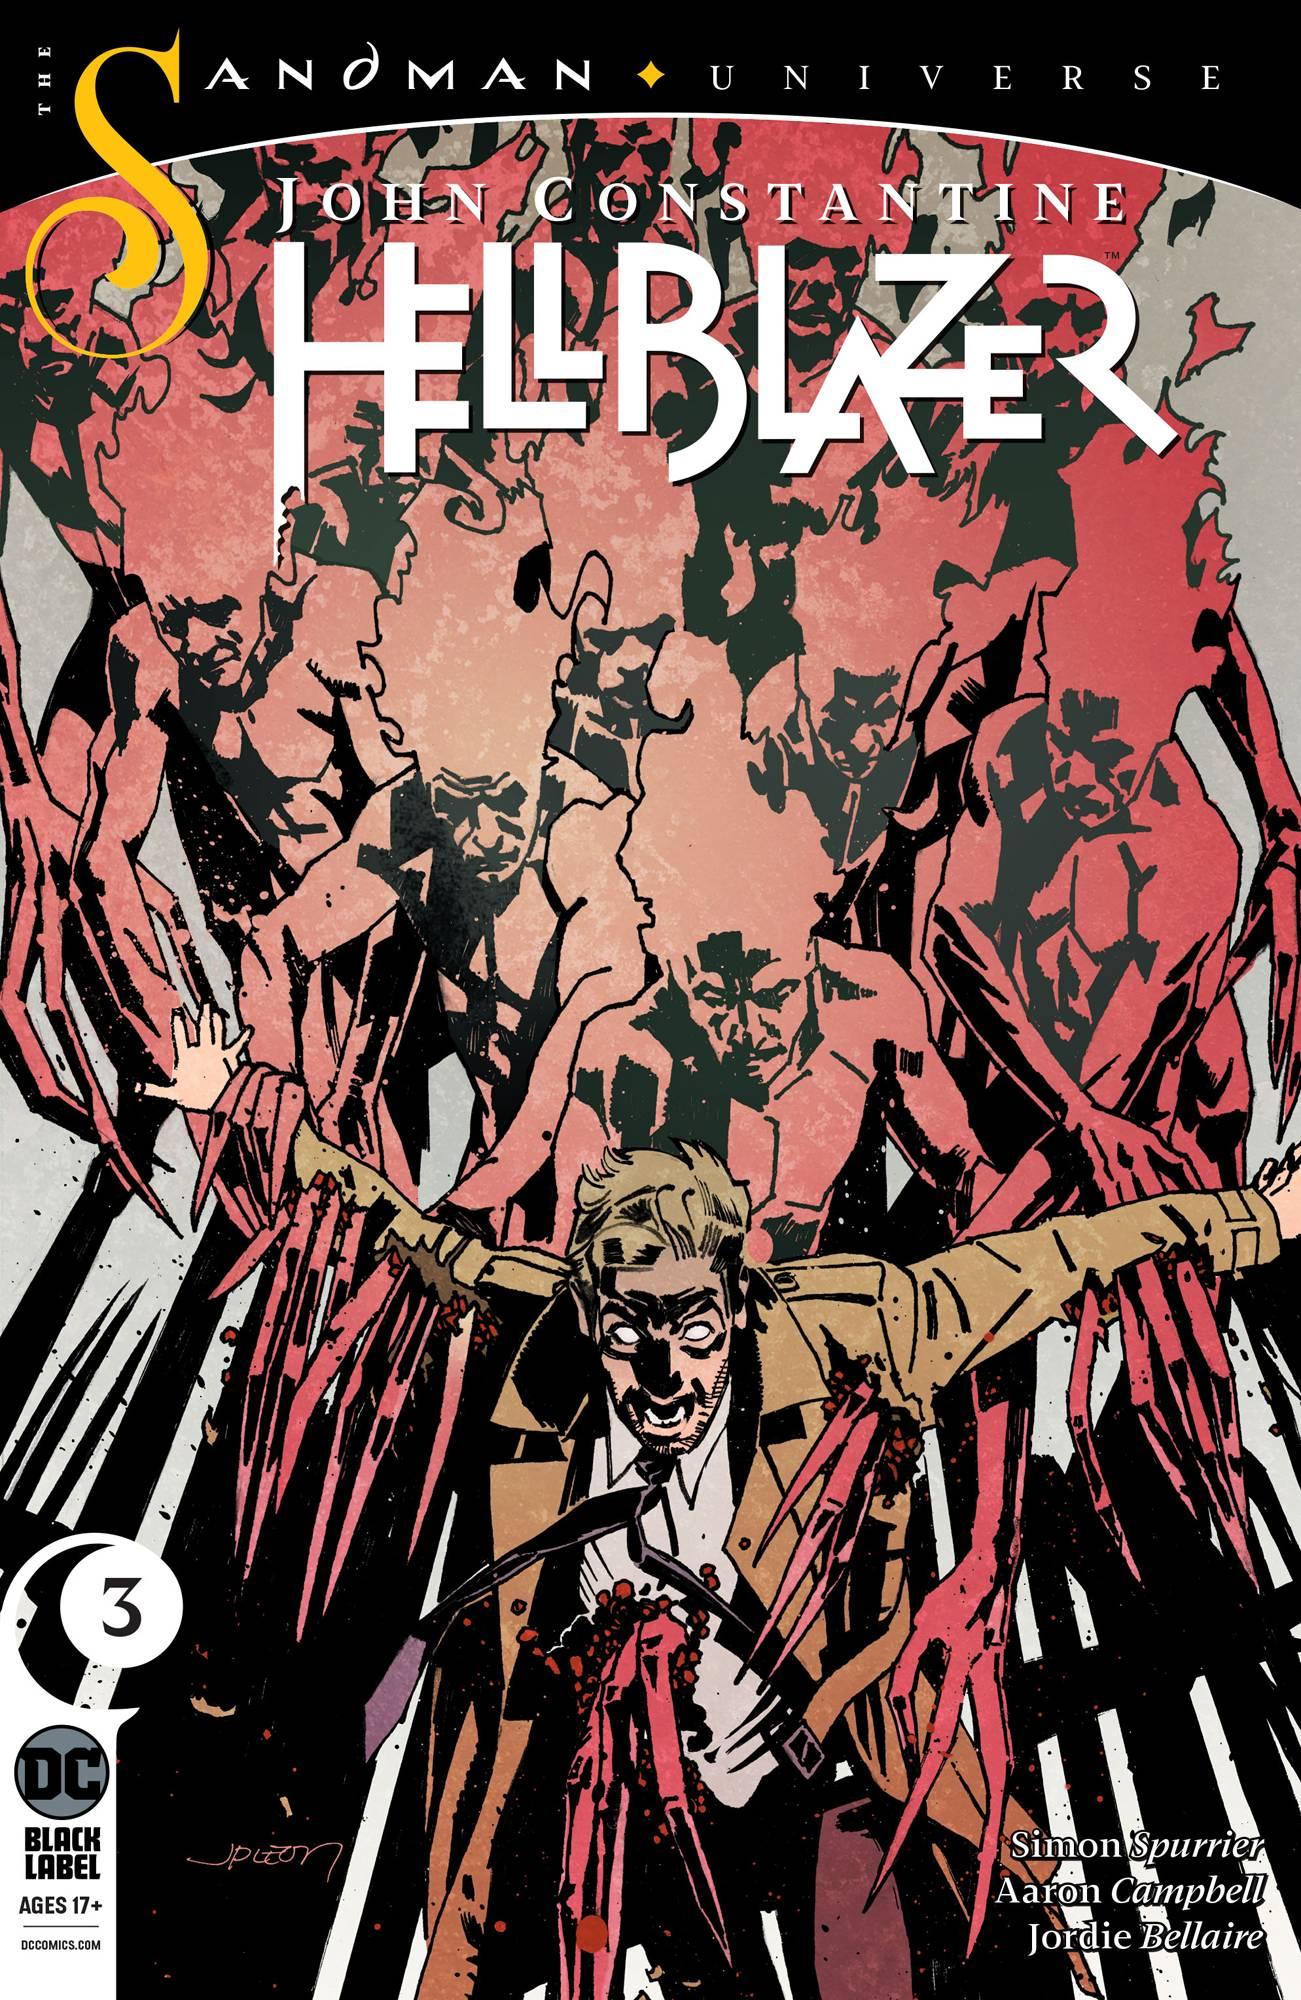 John Constantine Hellblazer #3 (2020)